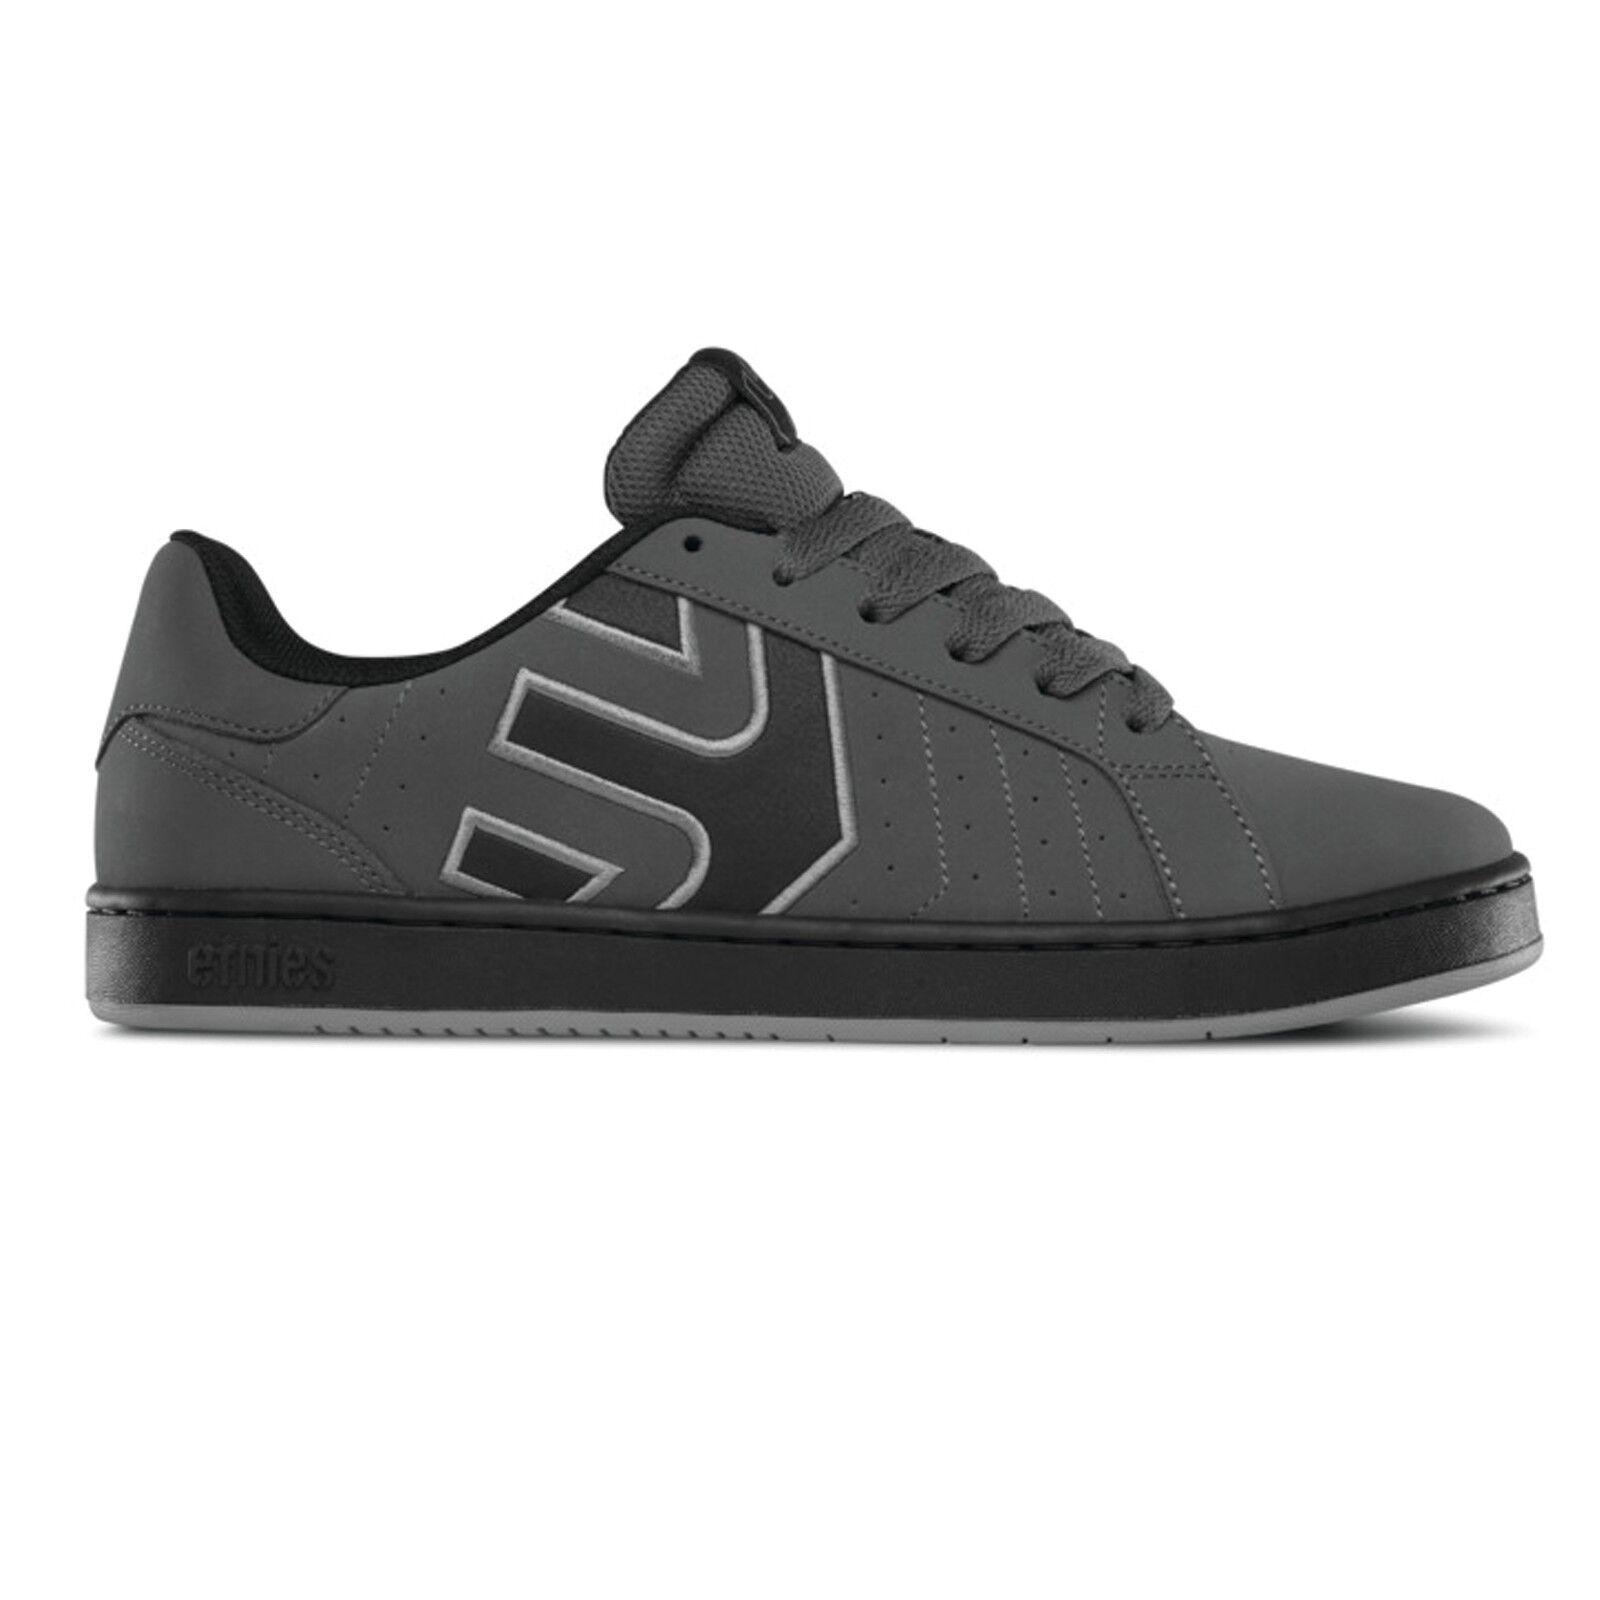 Etnies Zapatillas - Fader LS Zapatillas Etnies De Deporte Hombre Skate Gris oscuro Negro 022 4b8dcd